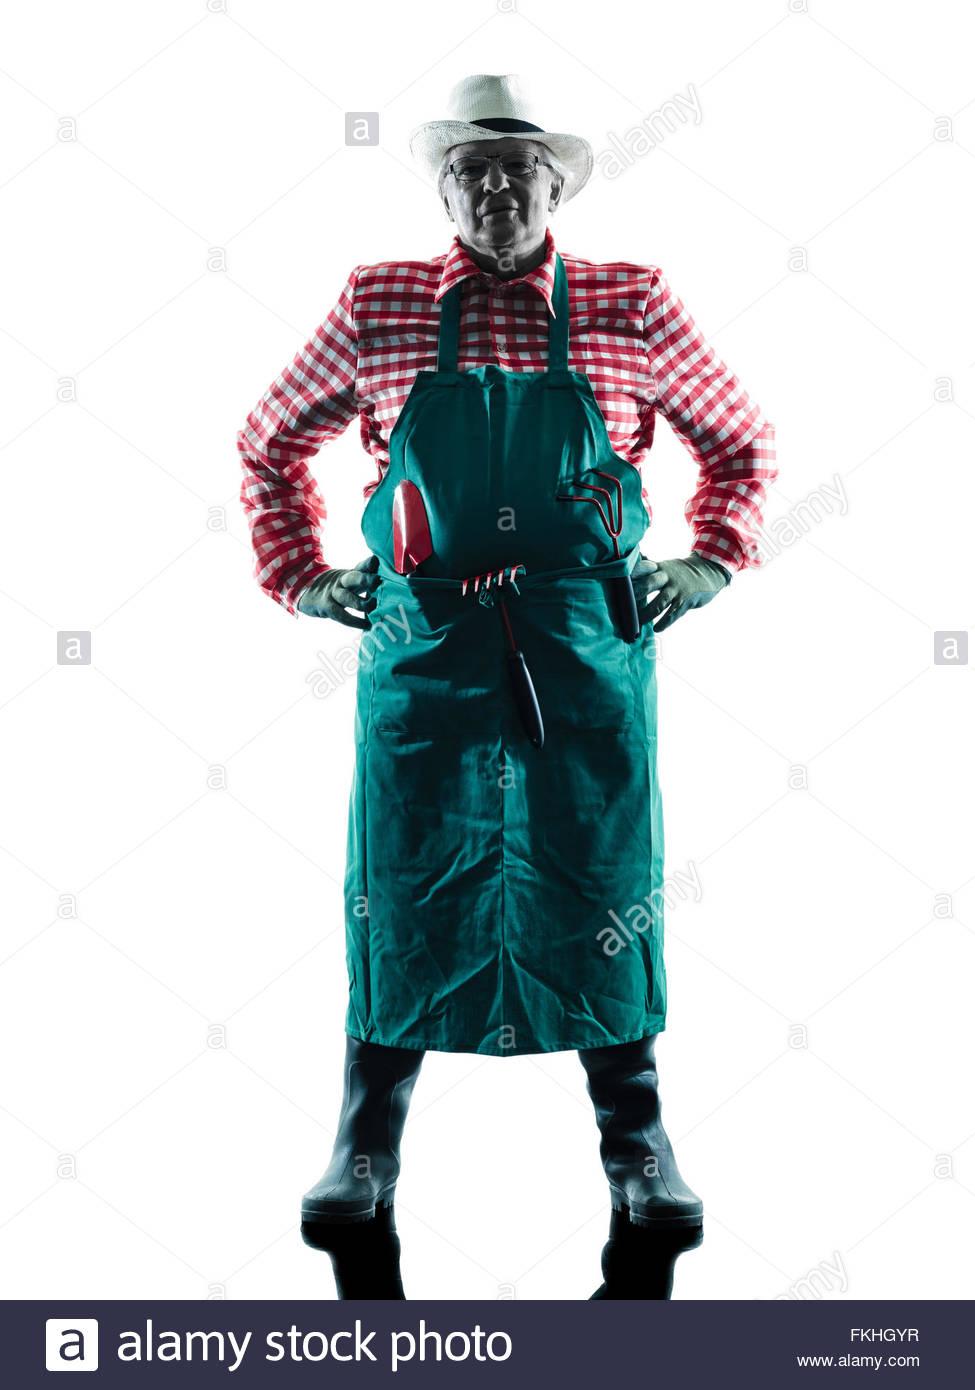 975x1390e Caucasian Man Gardener Man Gardening Silhouette Isolated